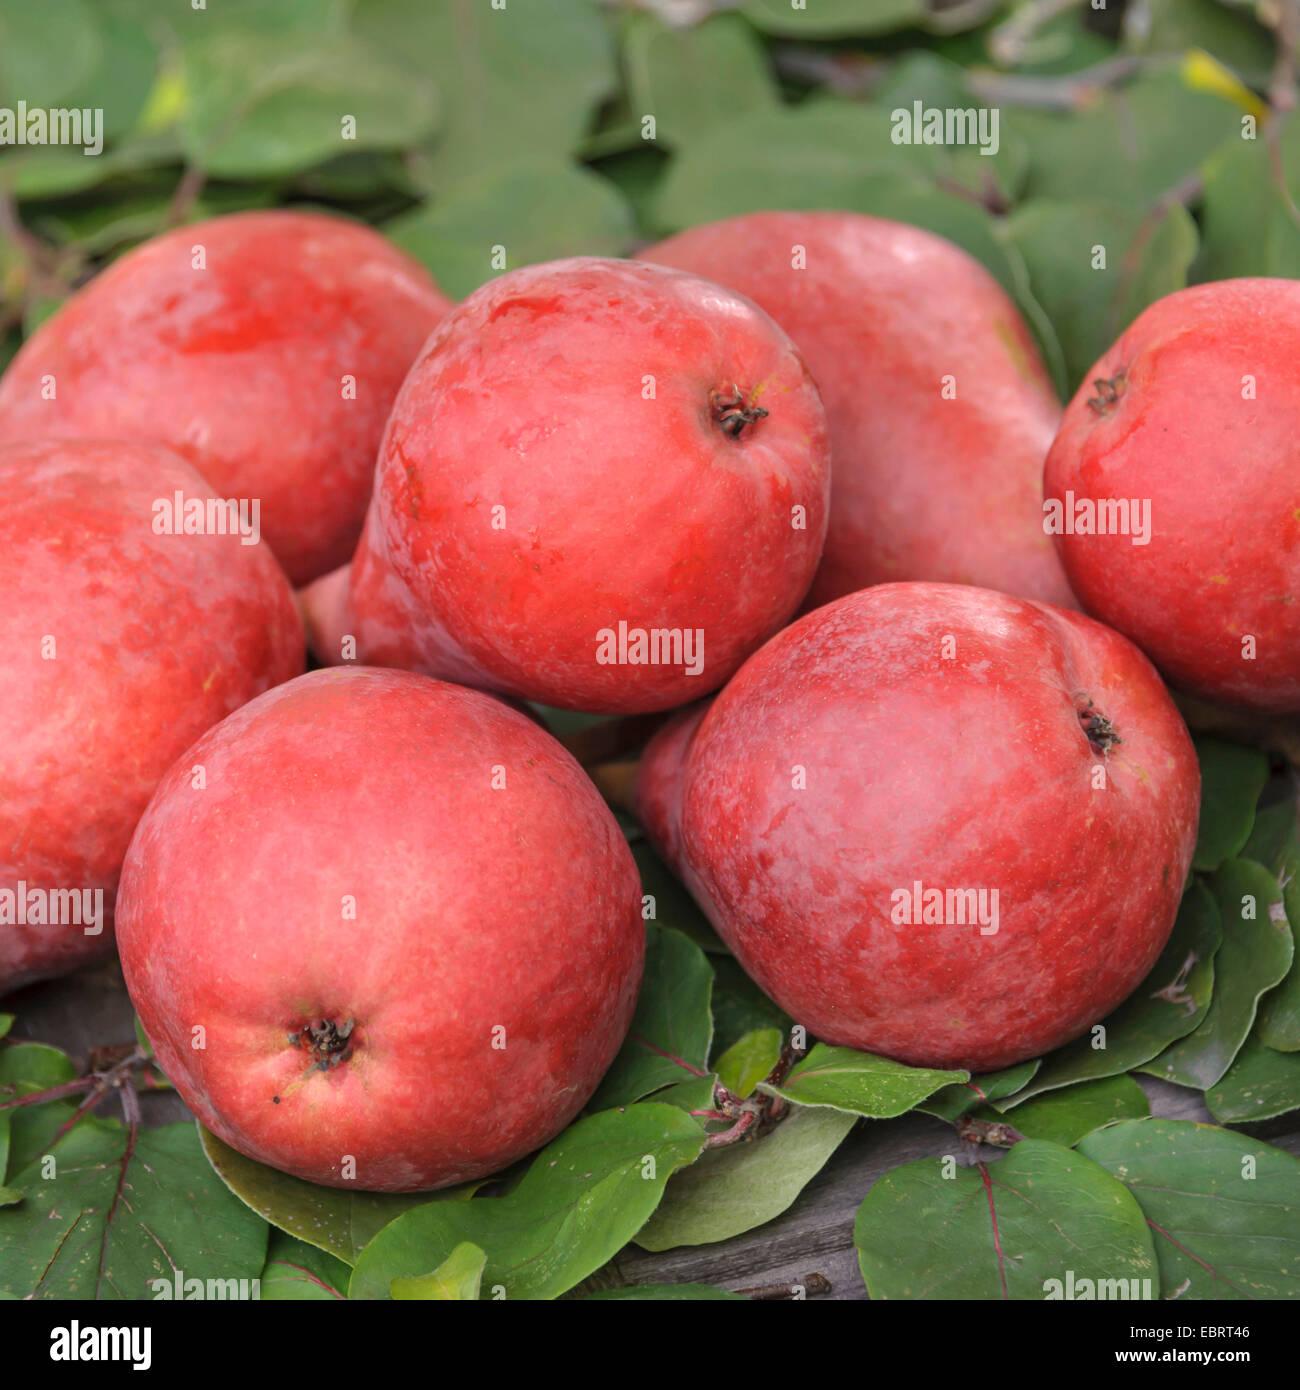 Common pear (Pyrus communis 'Starkrimson', Pyrus communis Starkrimson), pears of cultivar Starkrimson - Stock Image